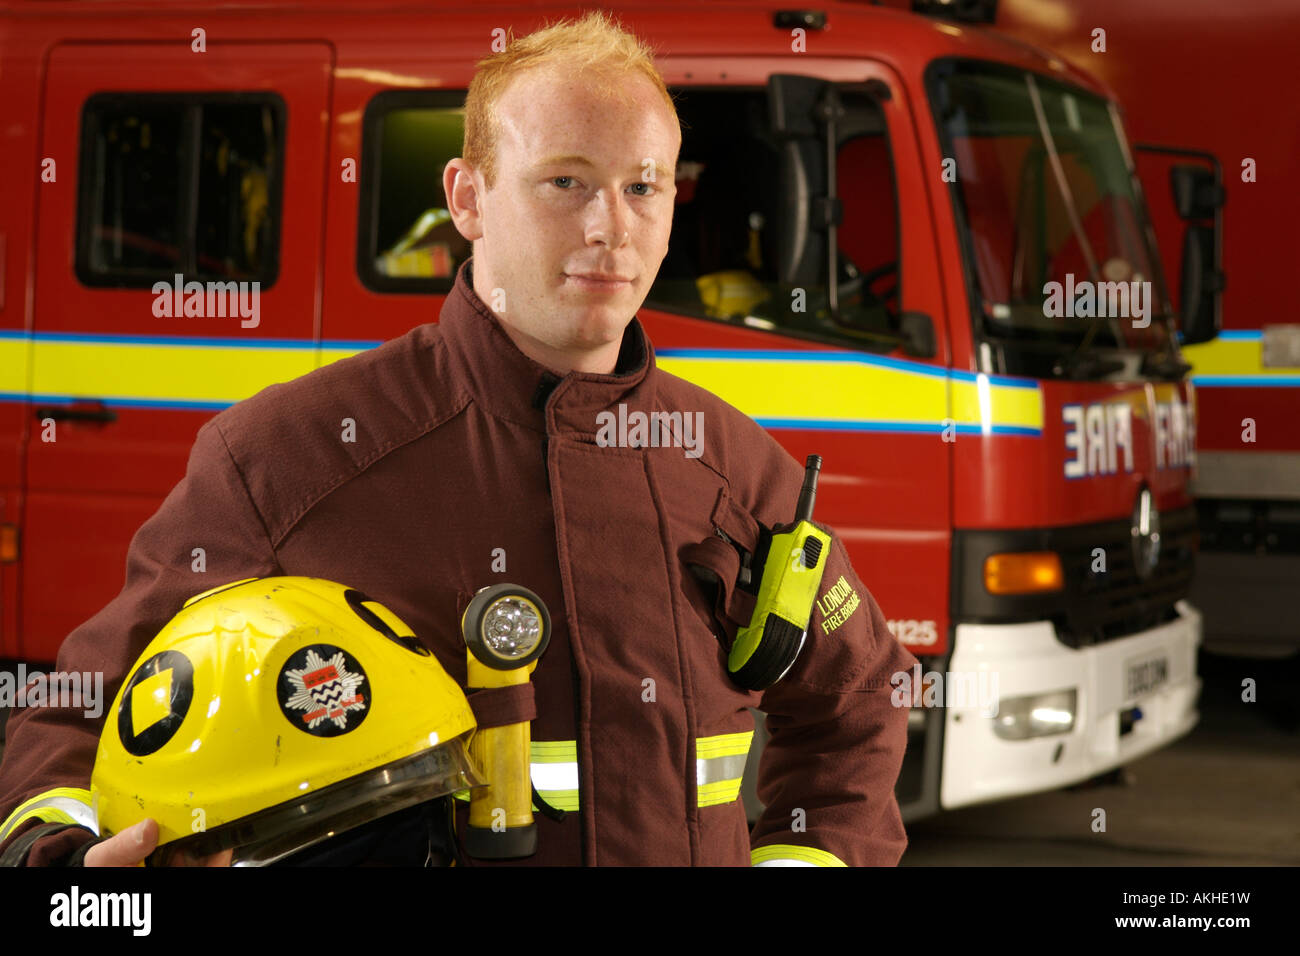 Portrait Of London Fire Brigade Fireman Dan Savva In Front